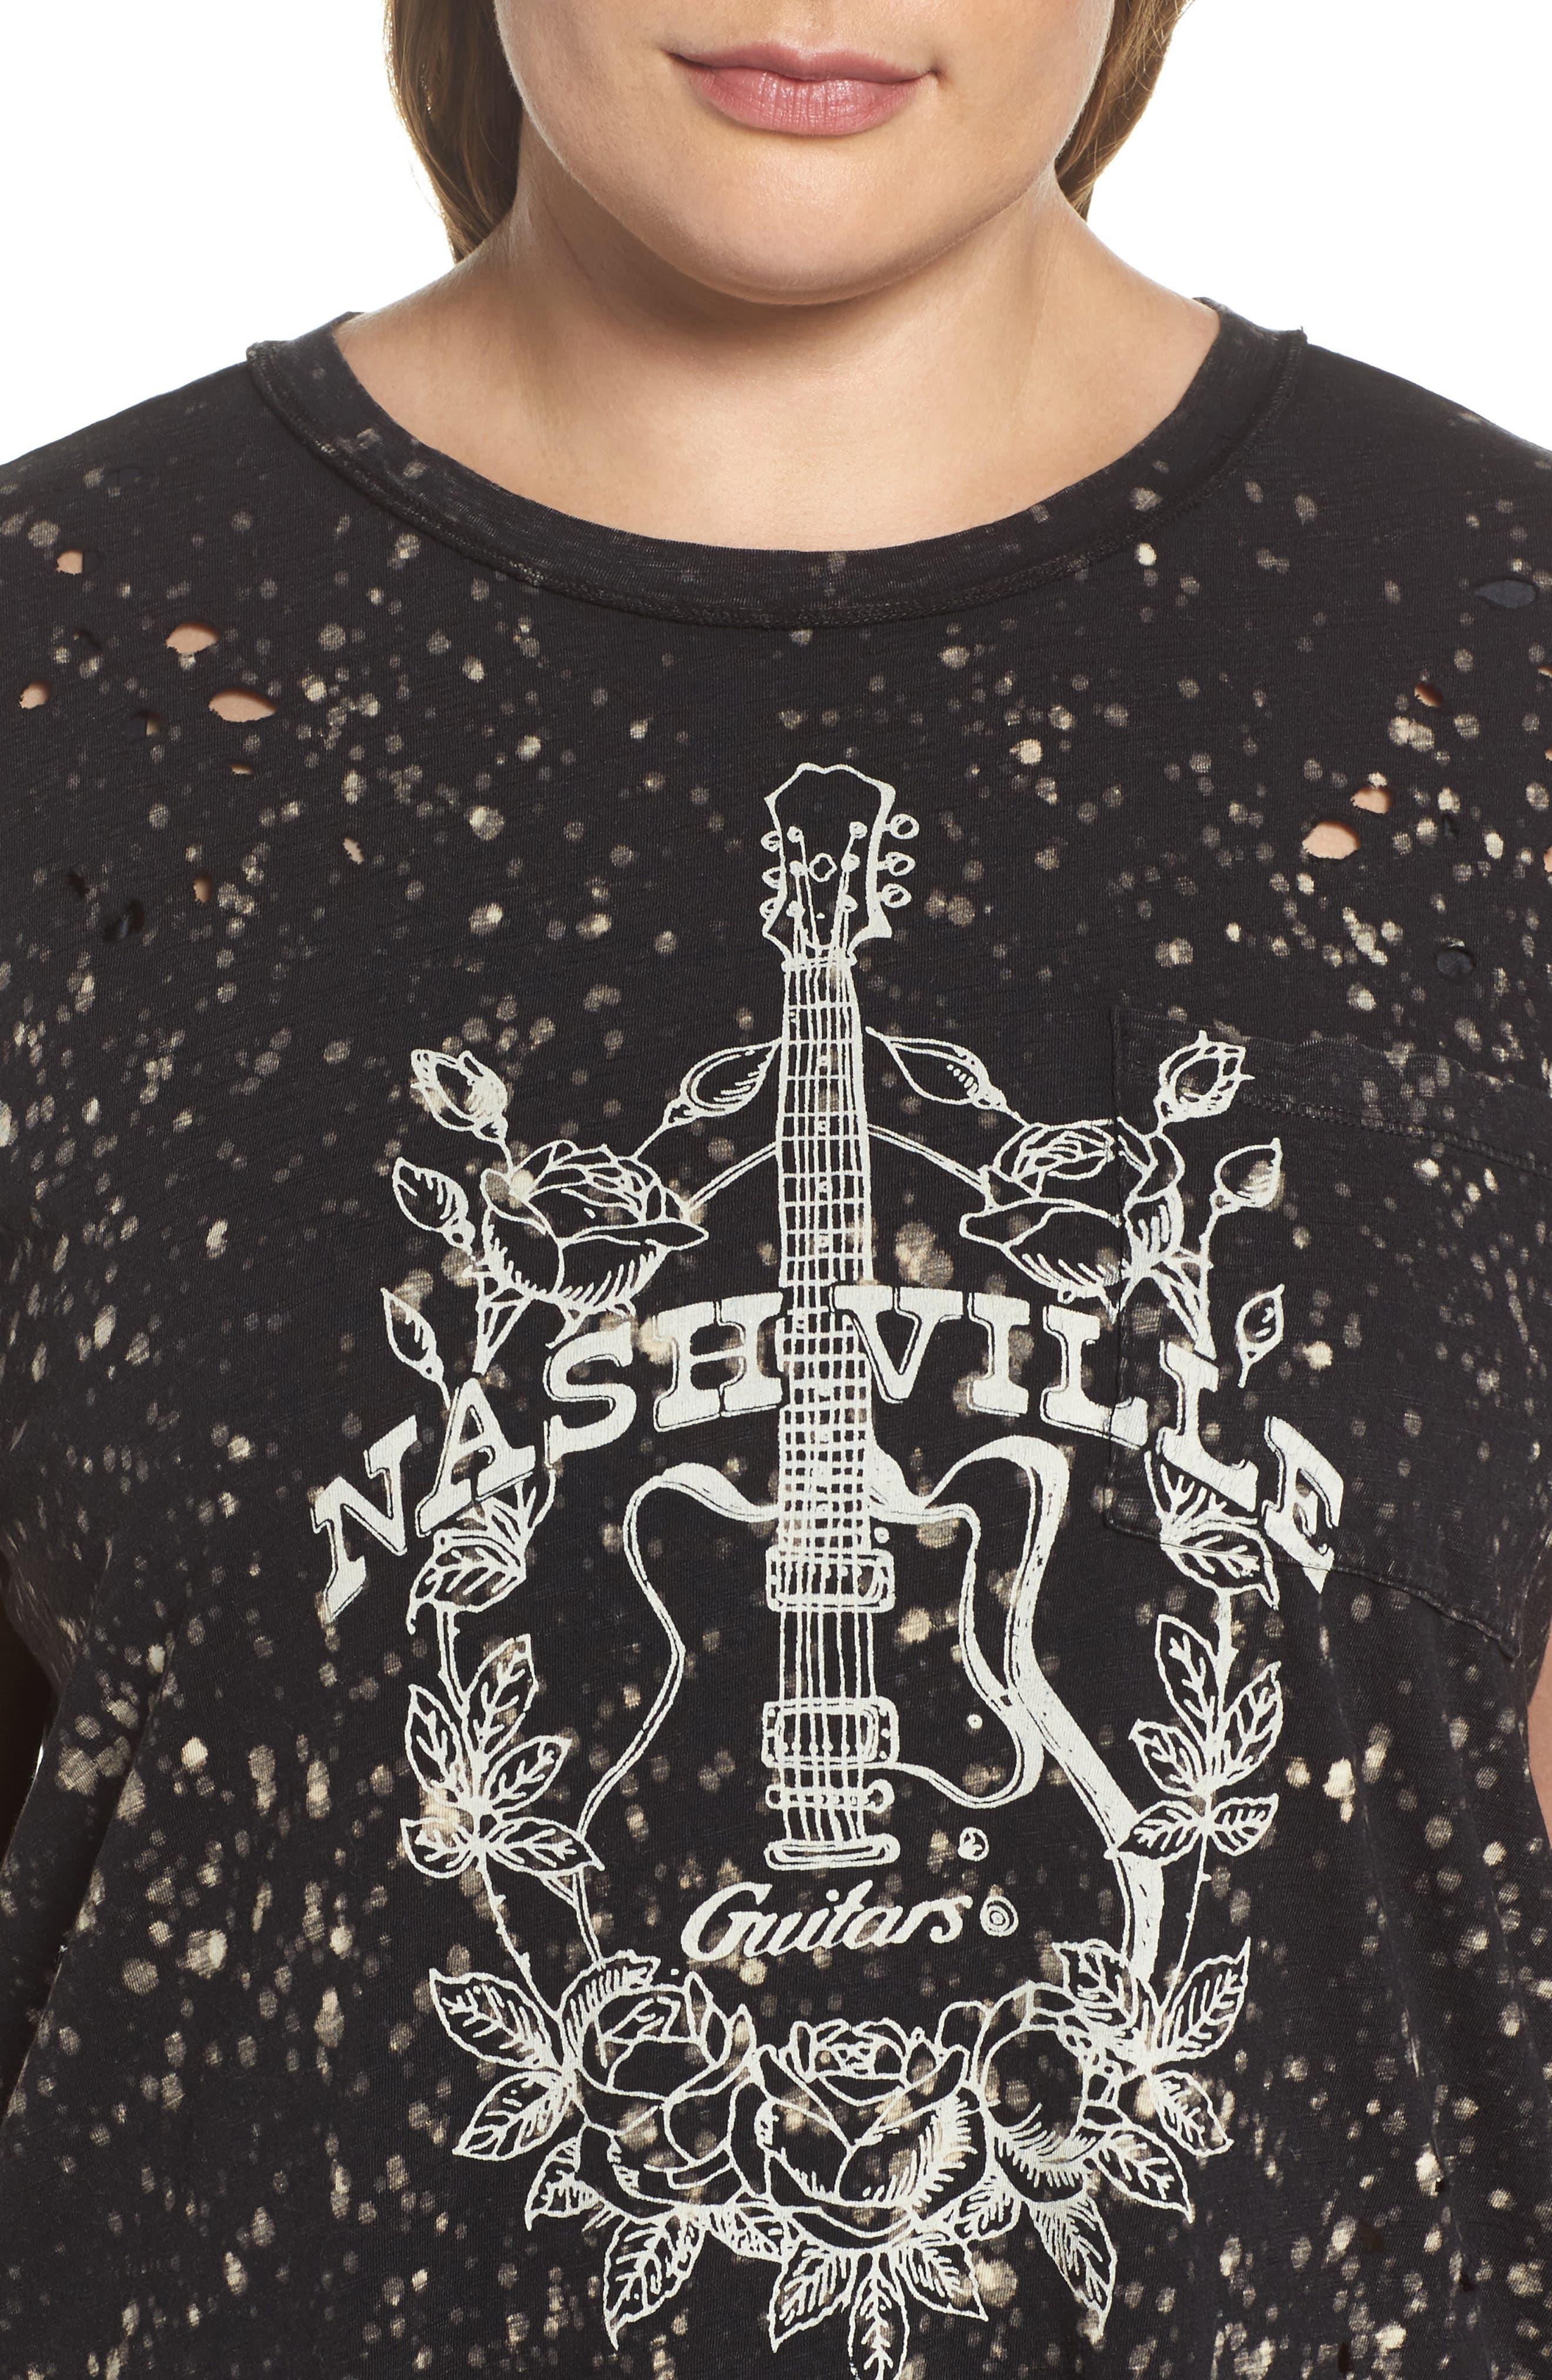 Nashville Guitars Crewneck Tee,                             Alternate thumbnail 4, color,                             Lucky Black